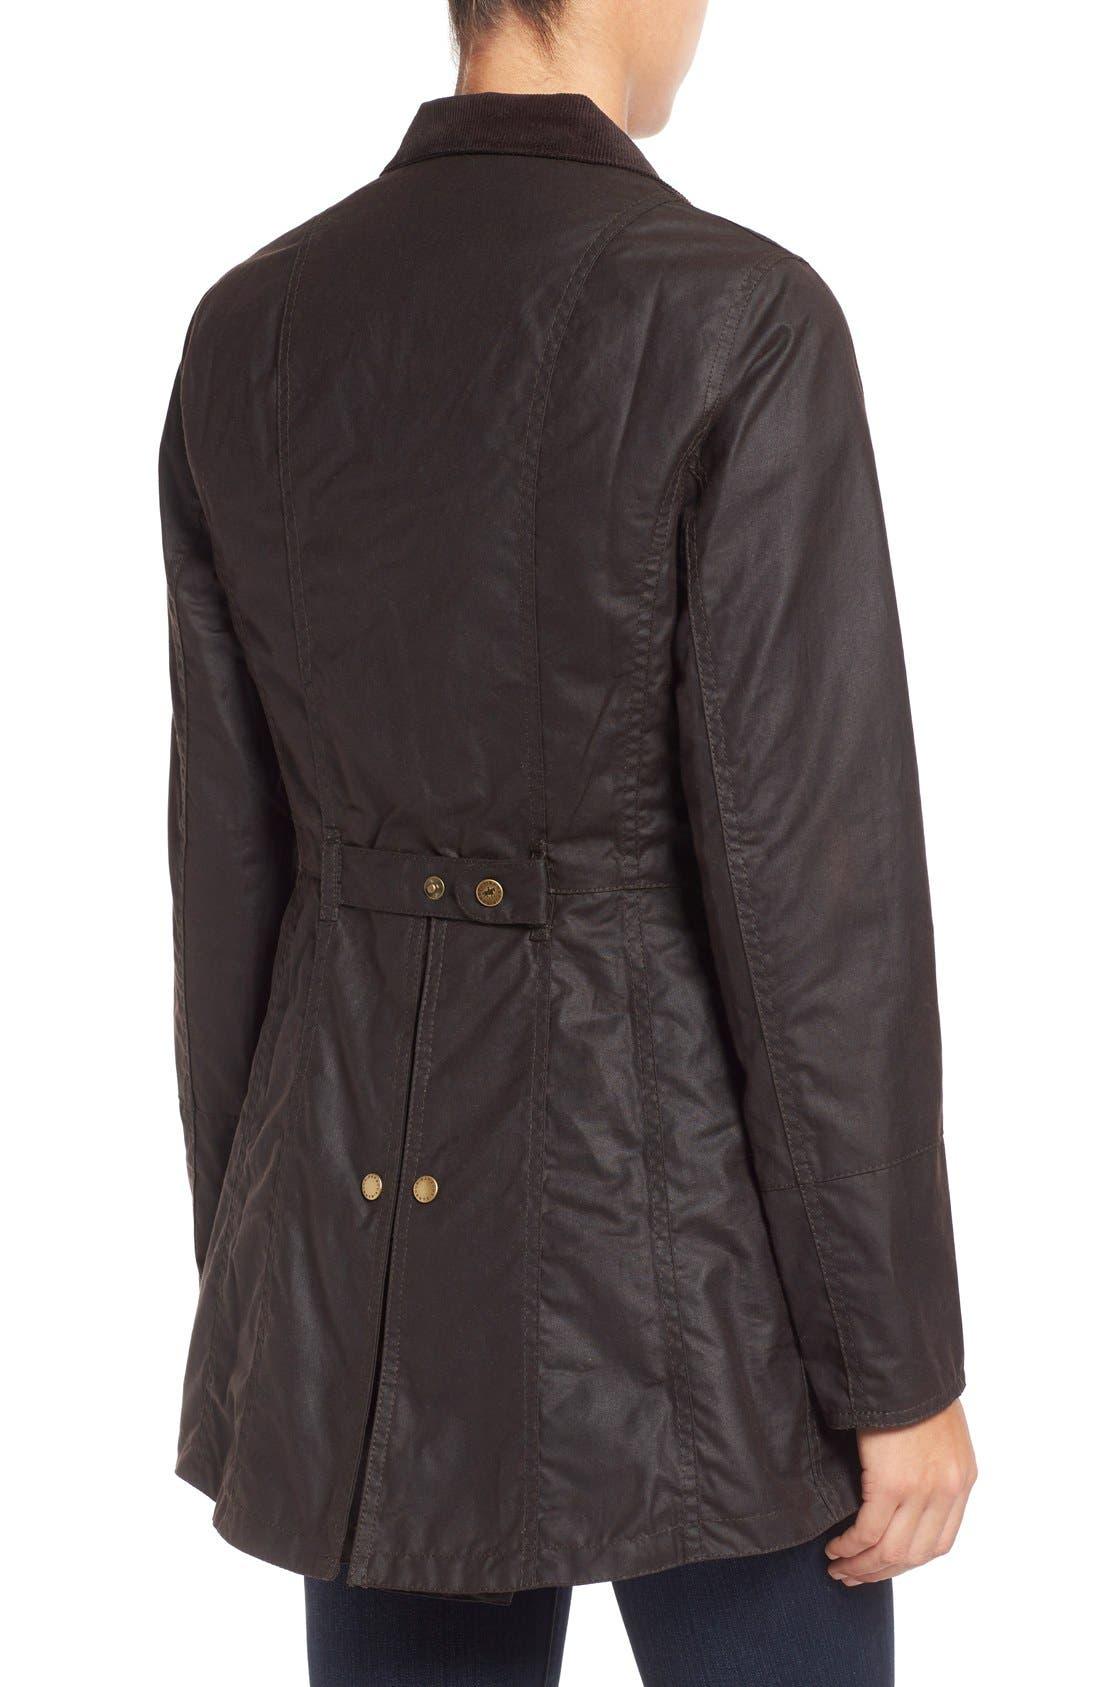 Alternate Image 3  - Barbour 'Holsteiner' Skirted Waxed Cotton Jacket